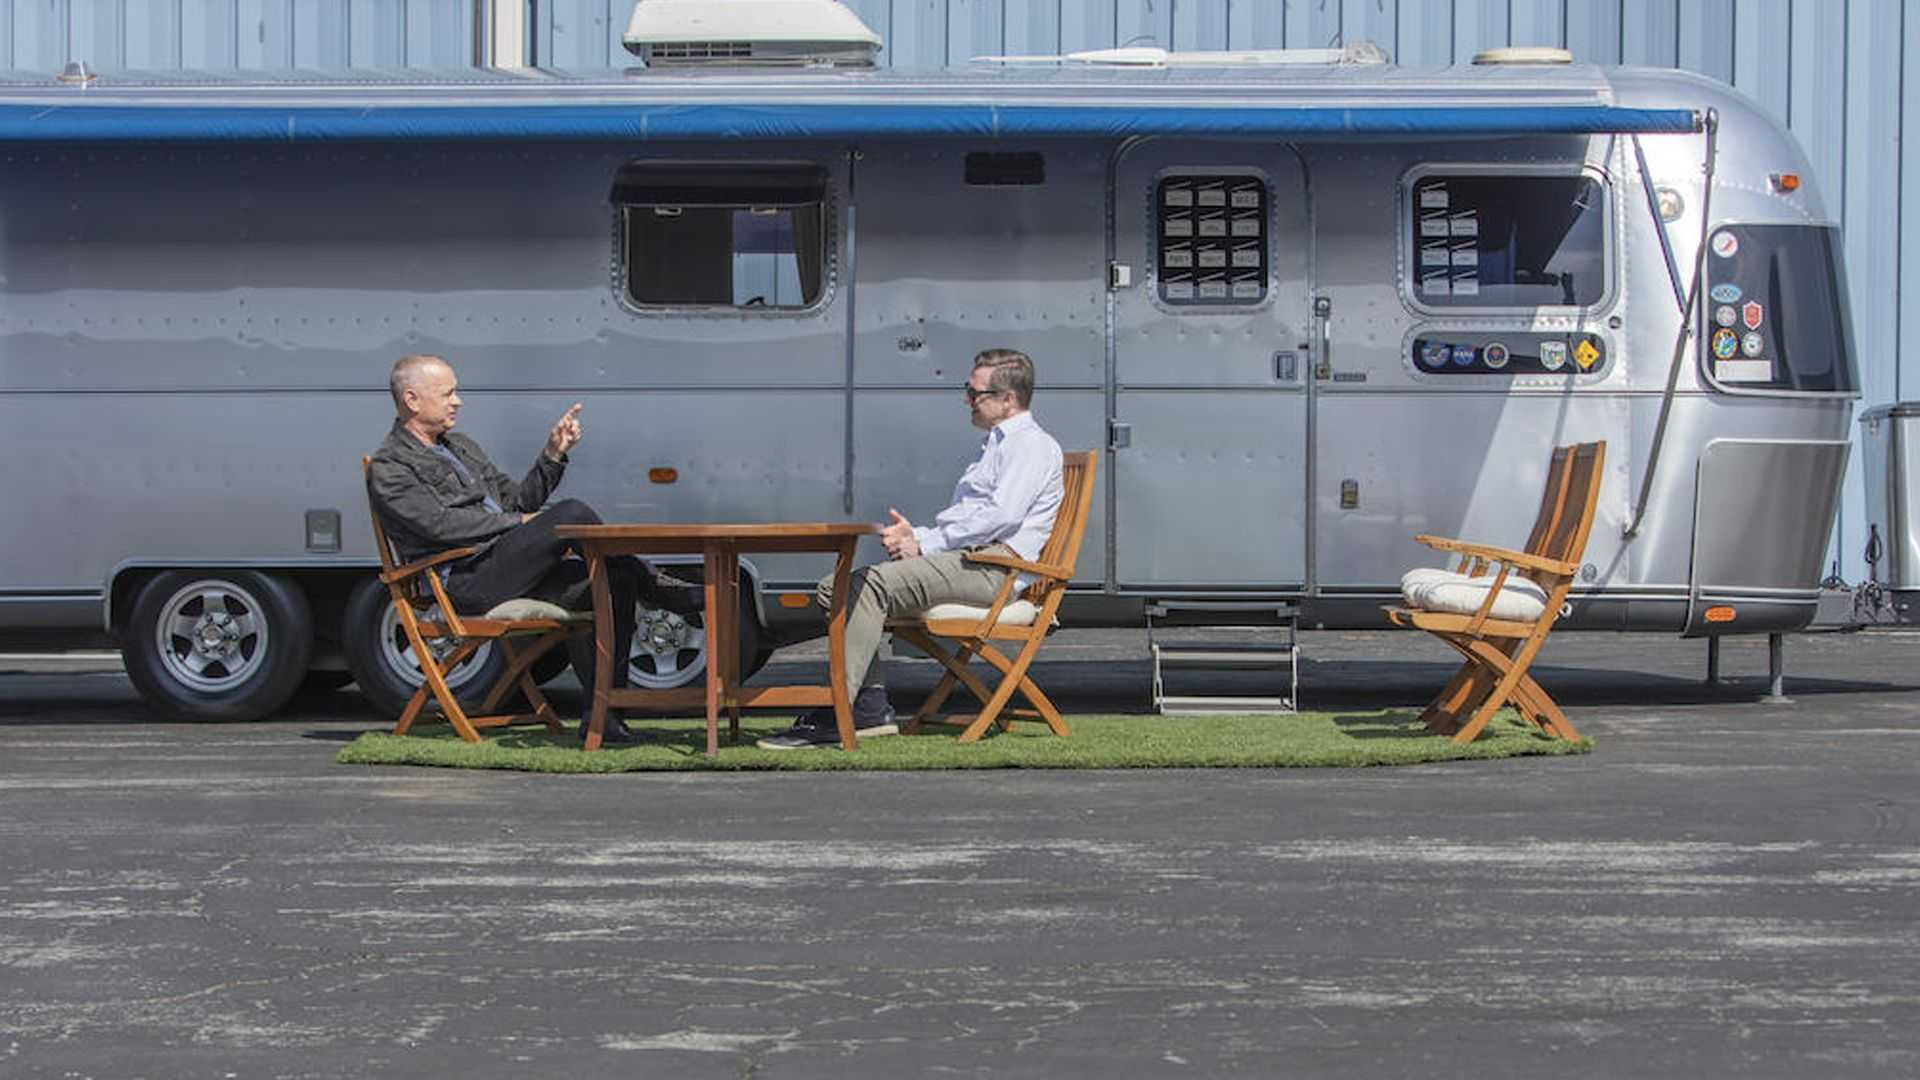 Tom-Hanks-Airstream-trailer-for-sale-4